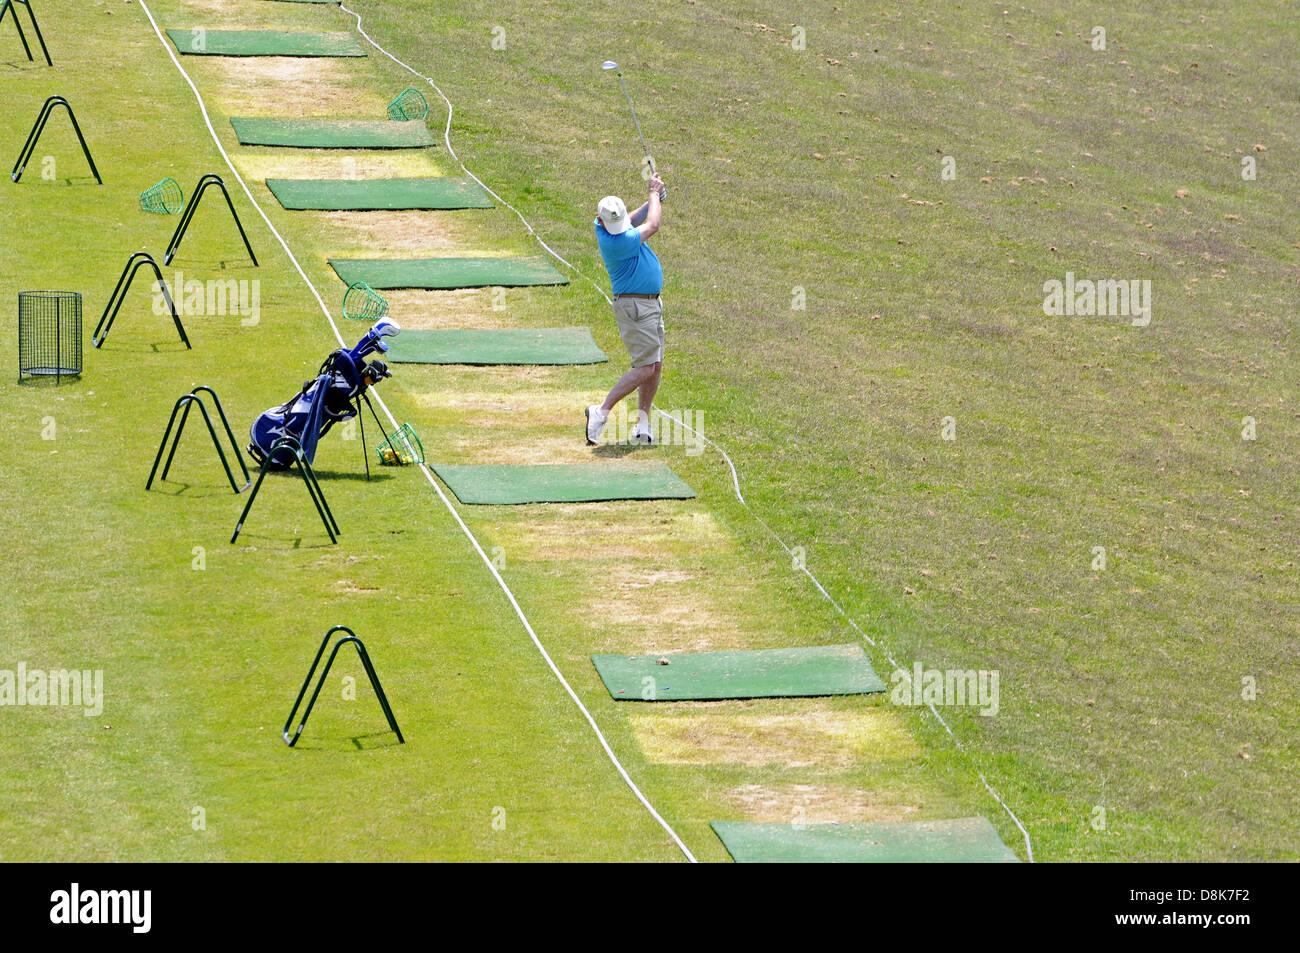 Golf Players - Stock Image